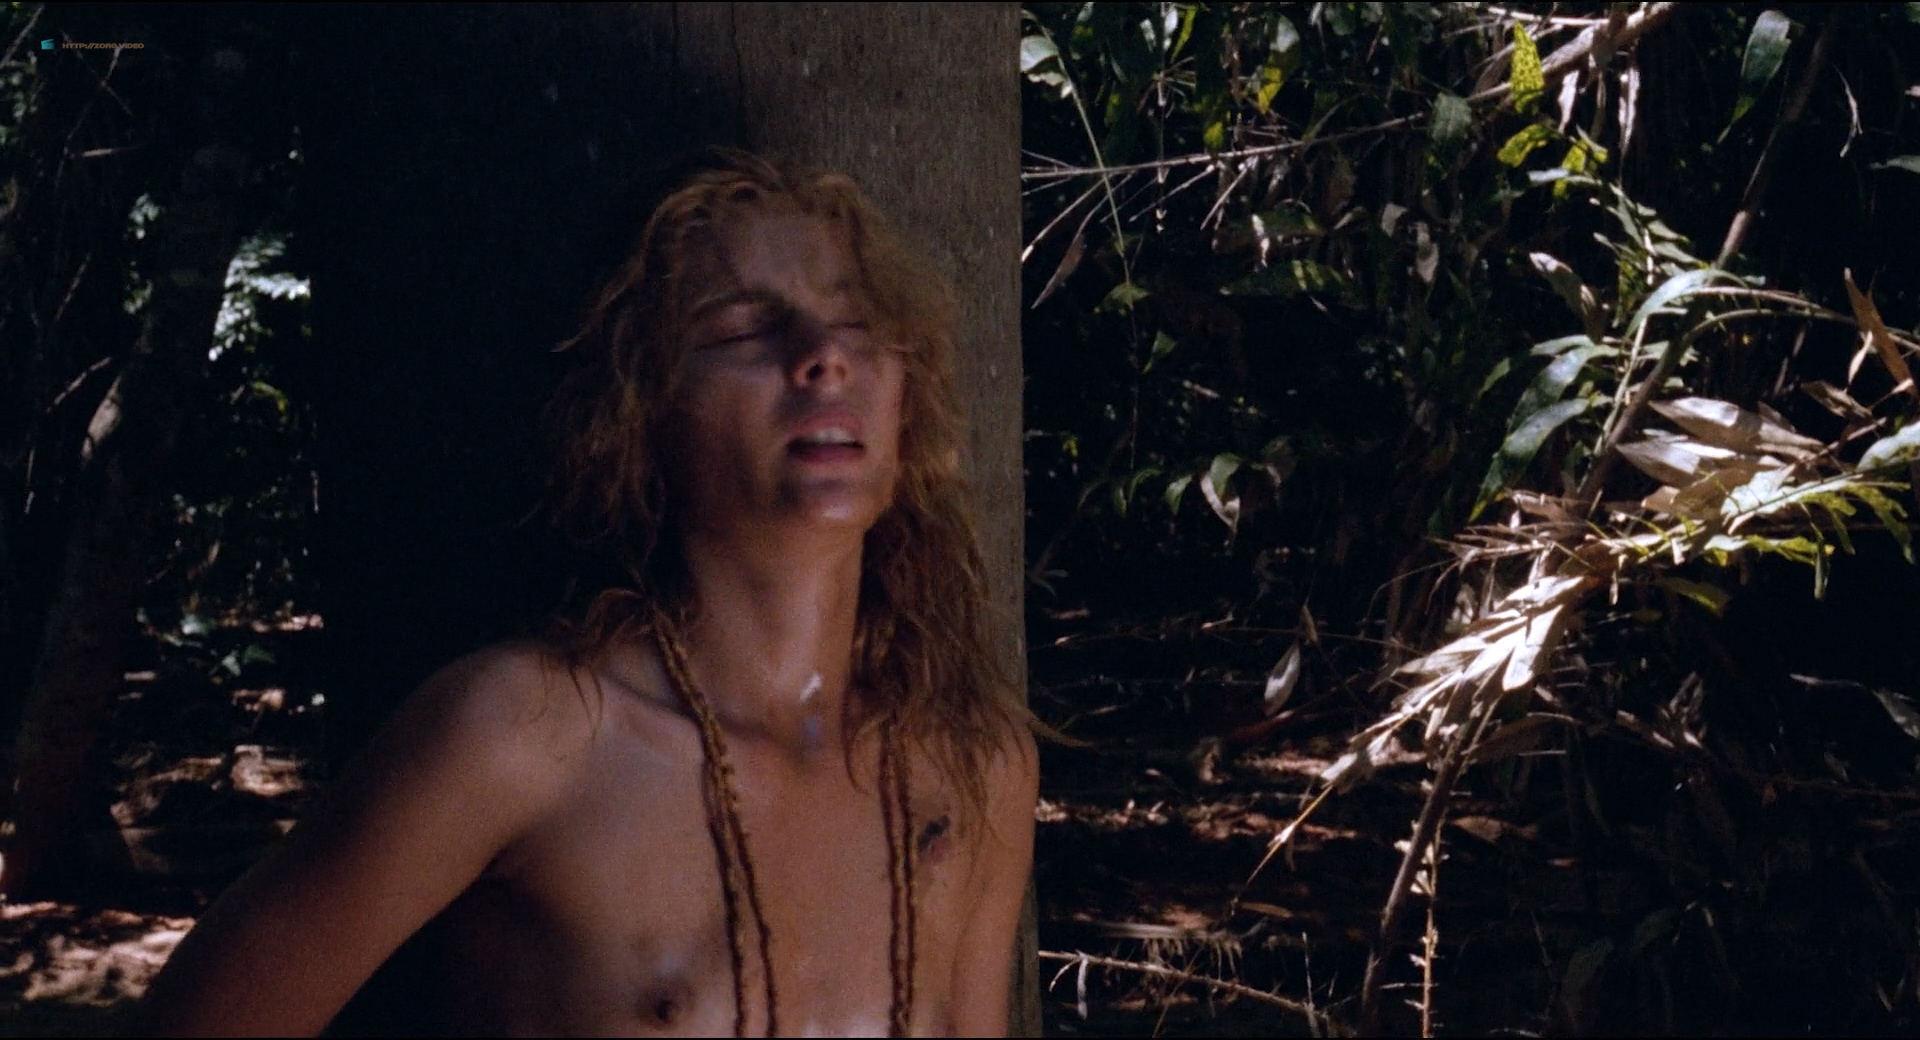 Elvire Audray nude Sara Fleszer, Jessica Bridges all nude full frontal - White Slave (IT-1985) HD 1080p BluRay (12)